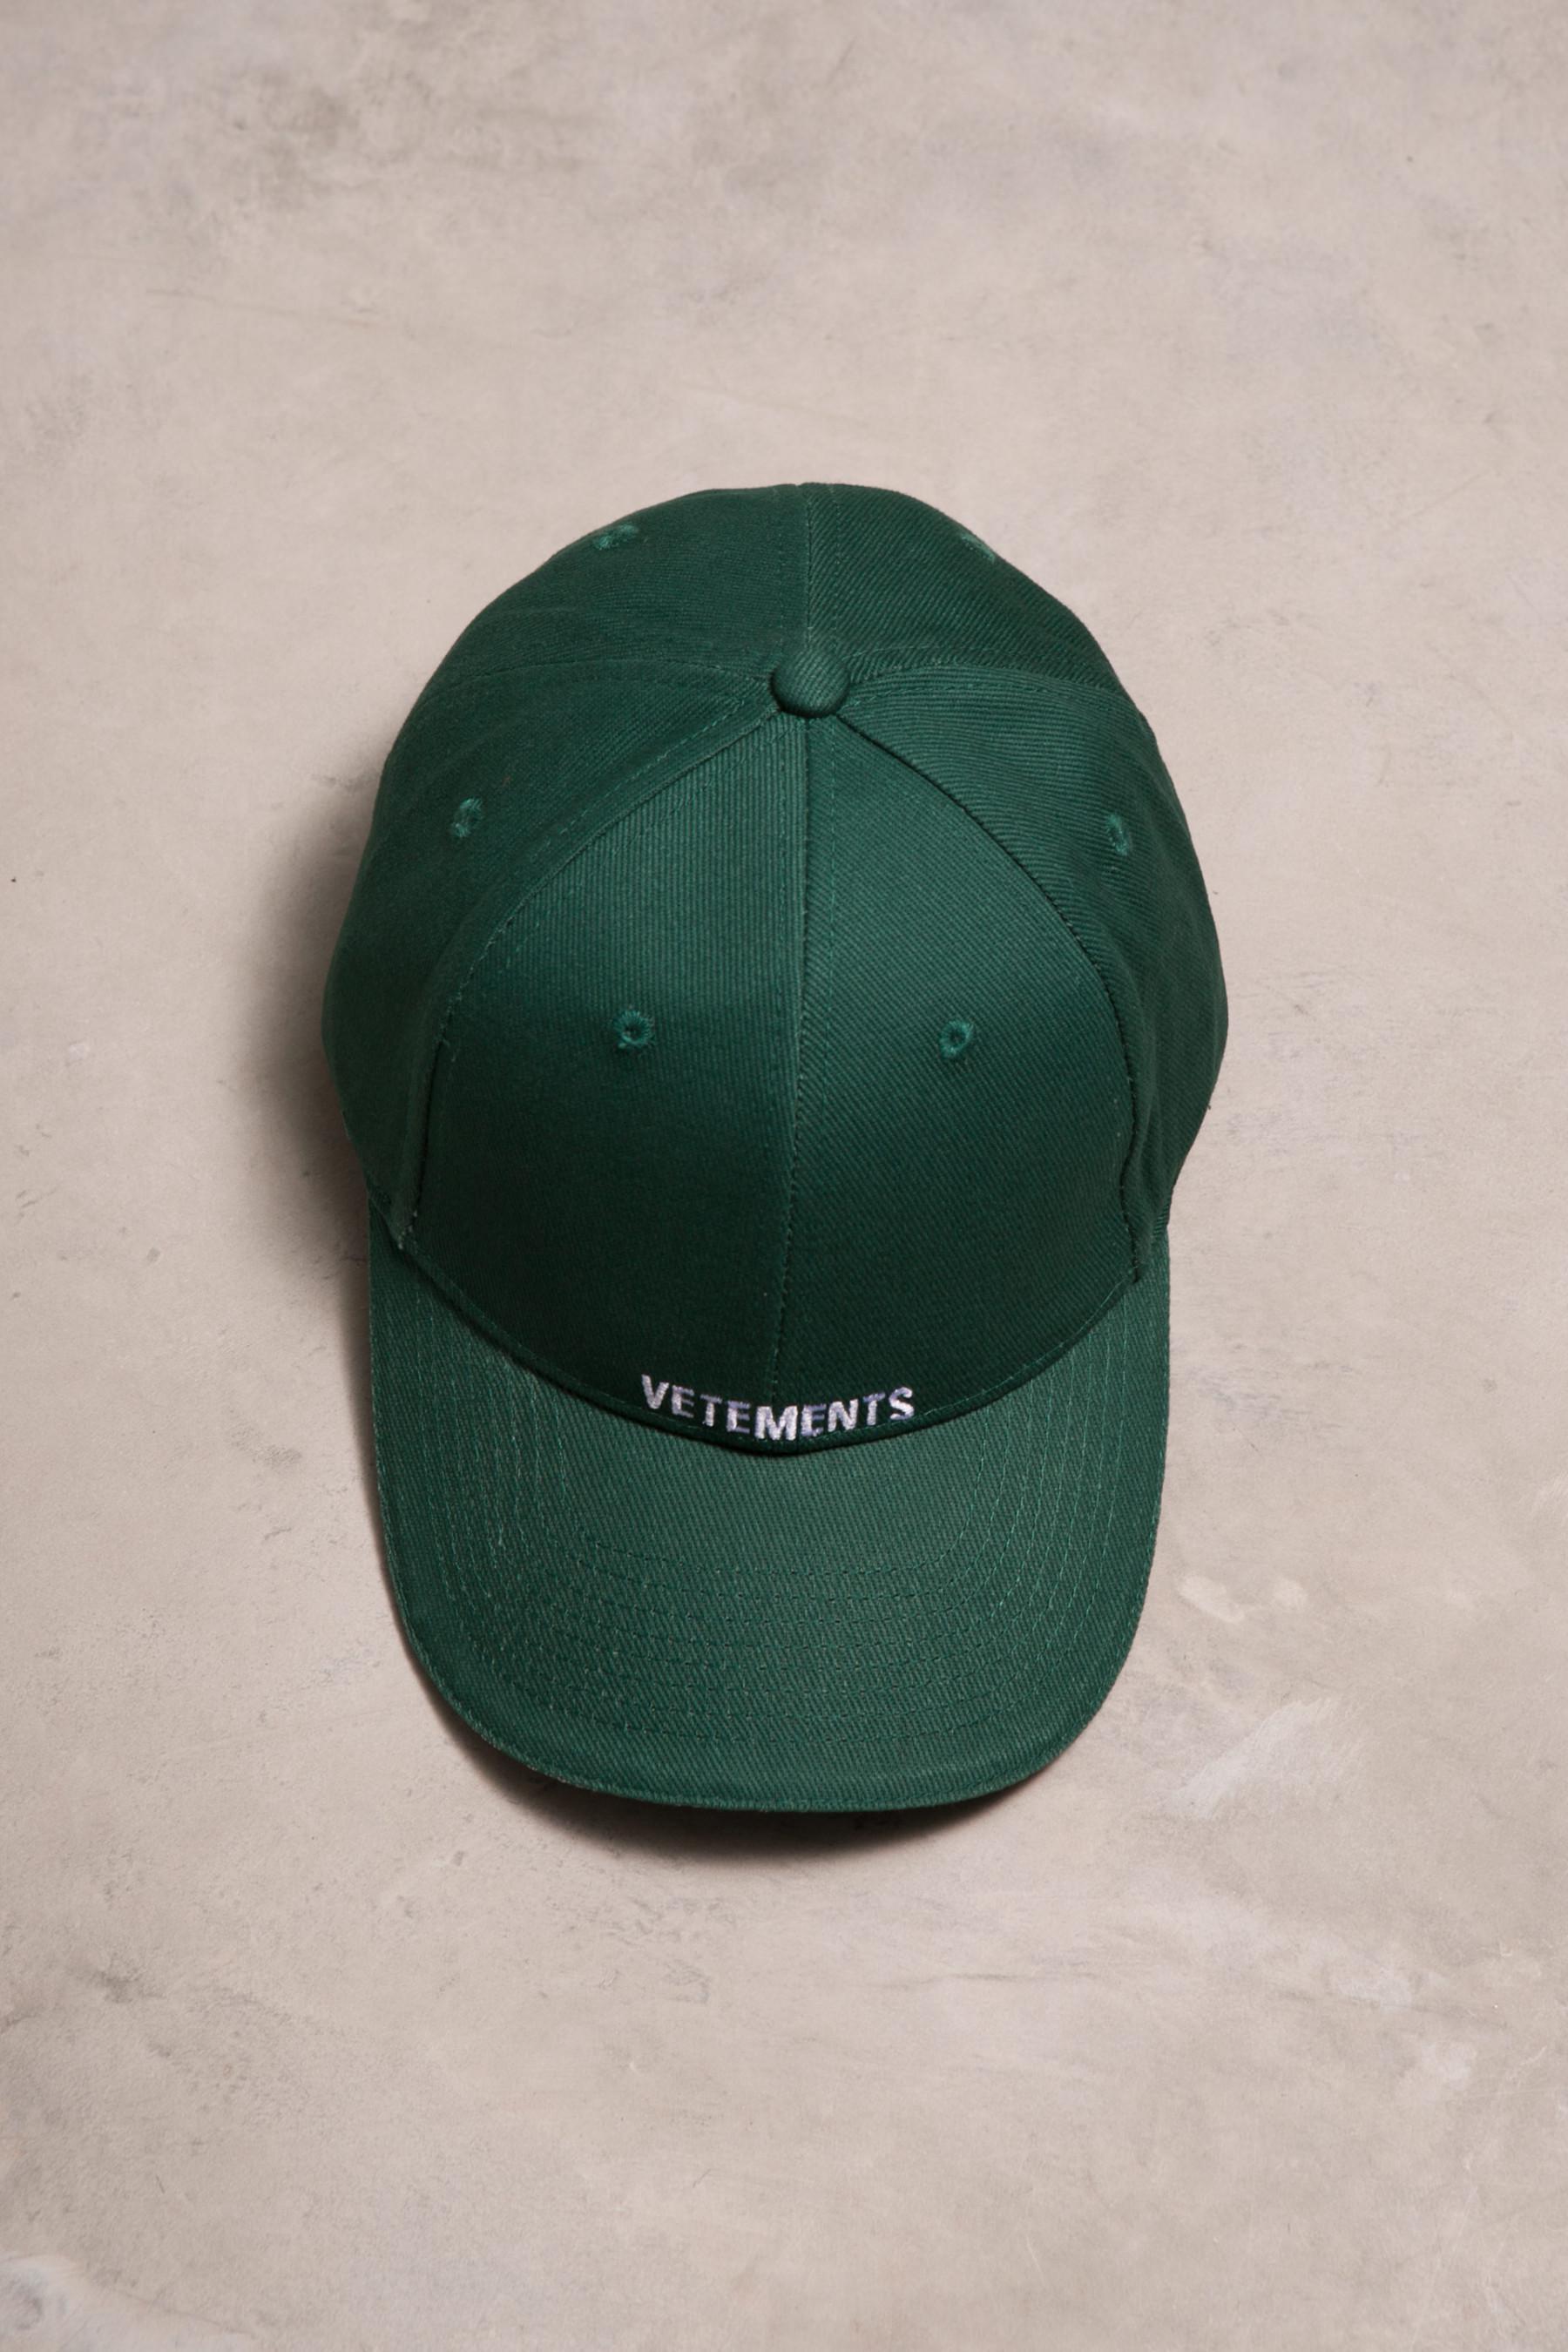 Lyst - Vetements Cap in Green for Men 26b1669cc108